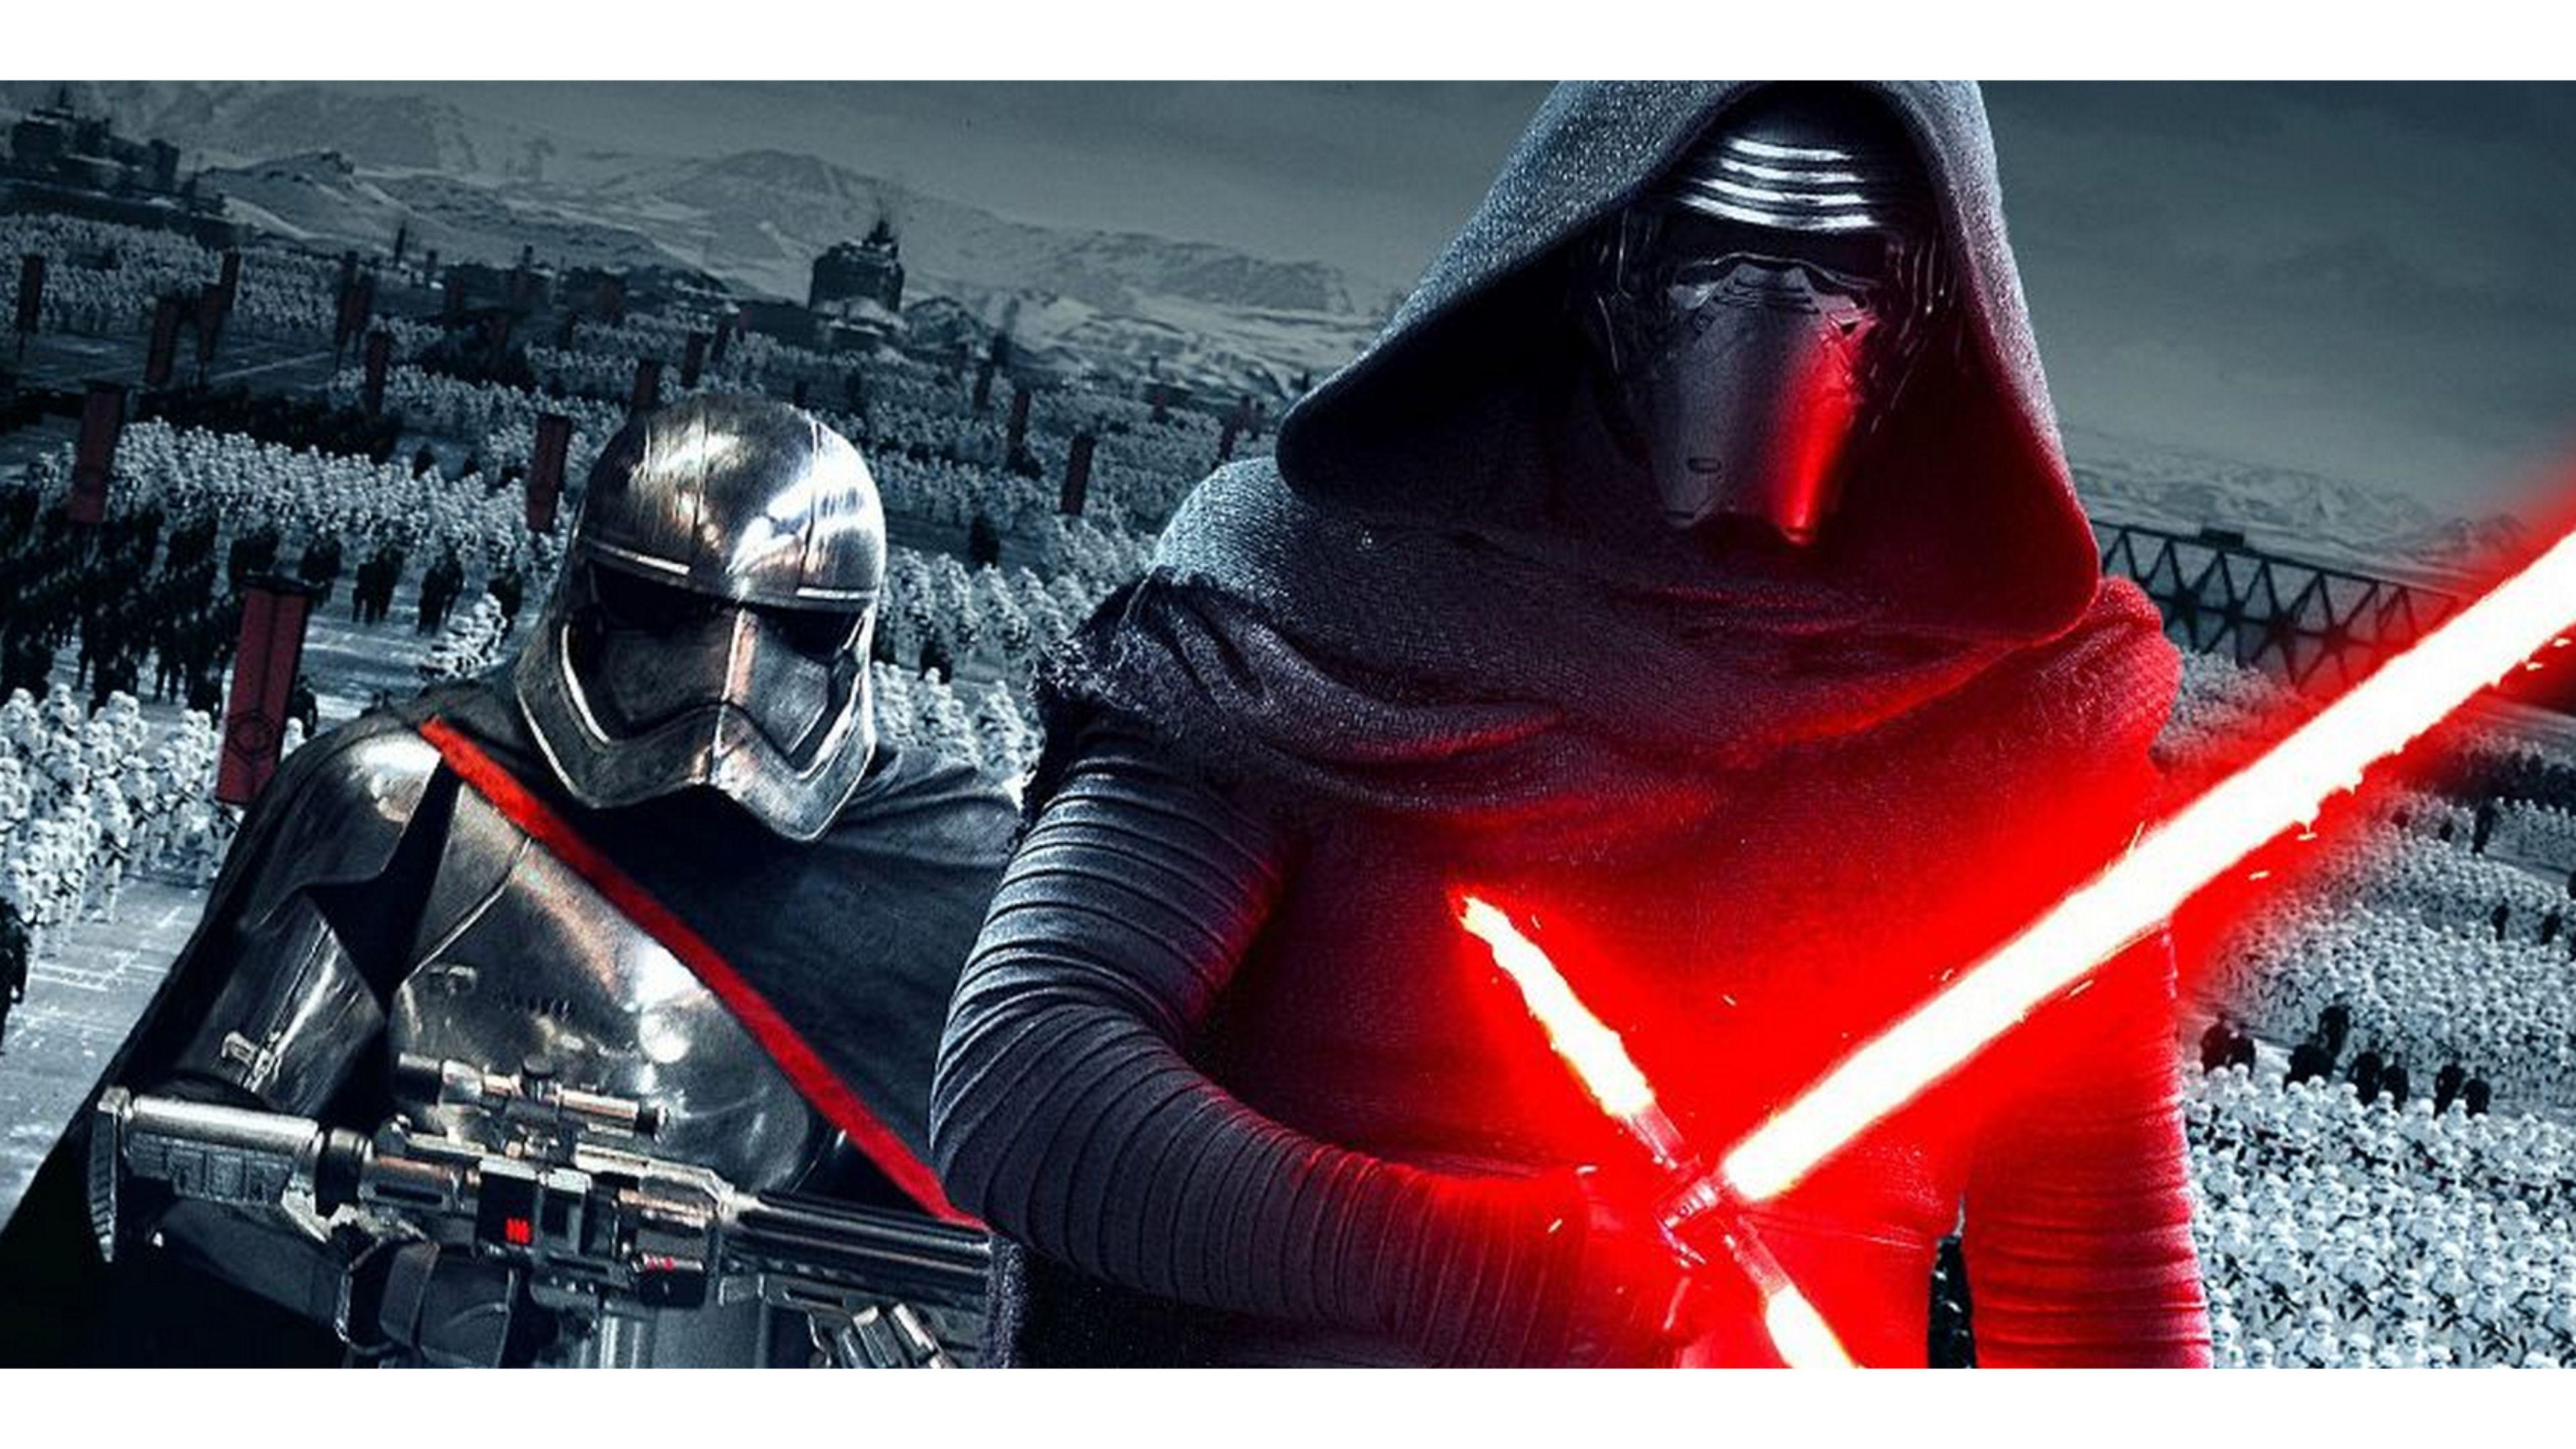 Epic Star Wars The Force Awakens 4k Wallpaper